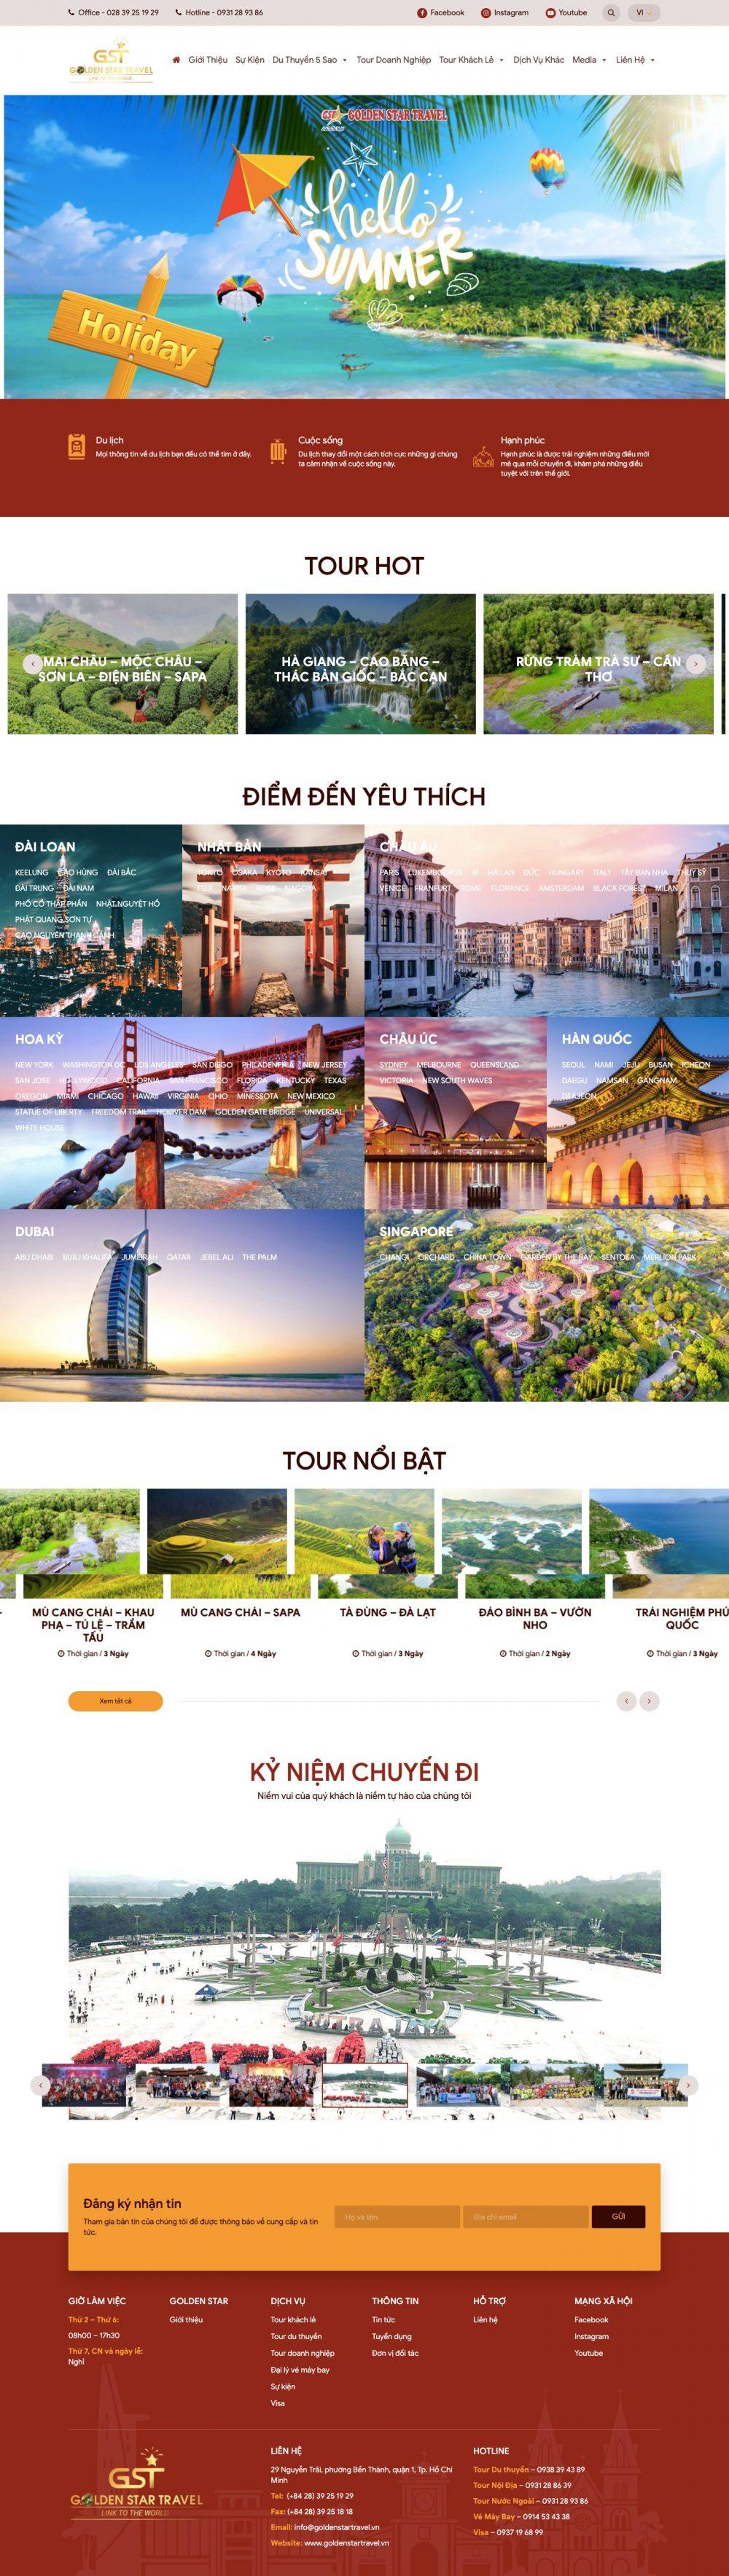 GOLDEN STAR TRAVEL – Chuyên cung cấp tour du lịch